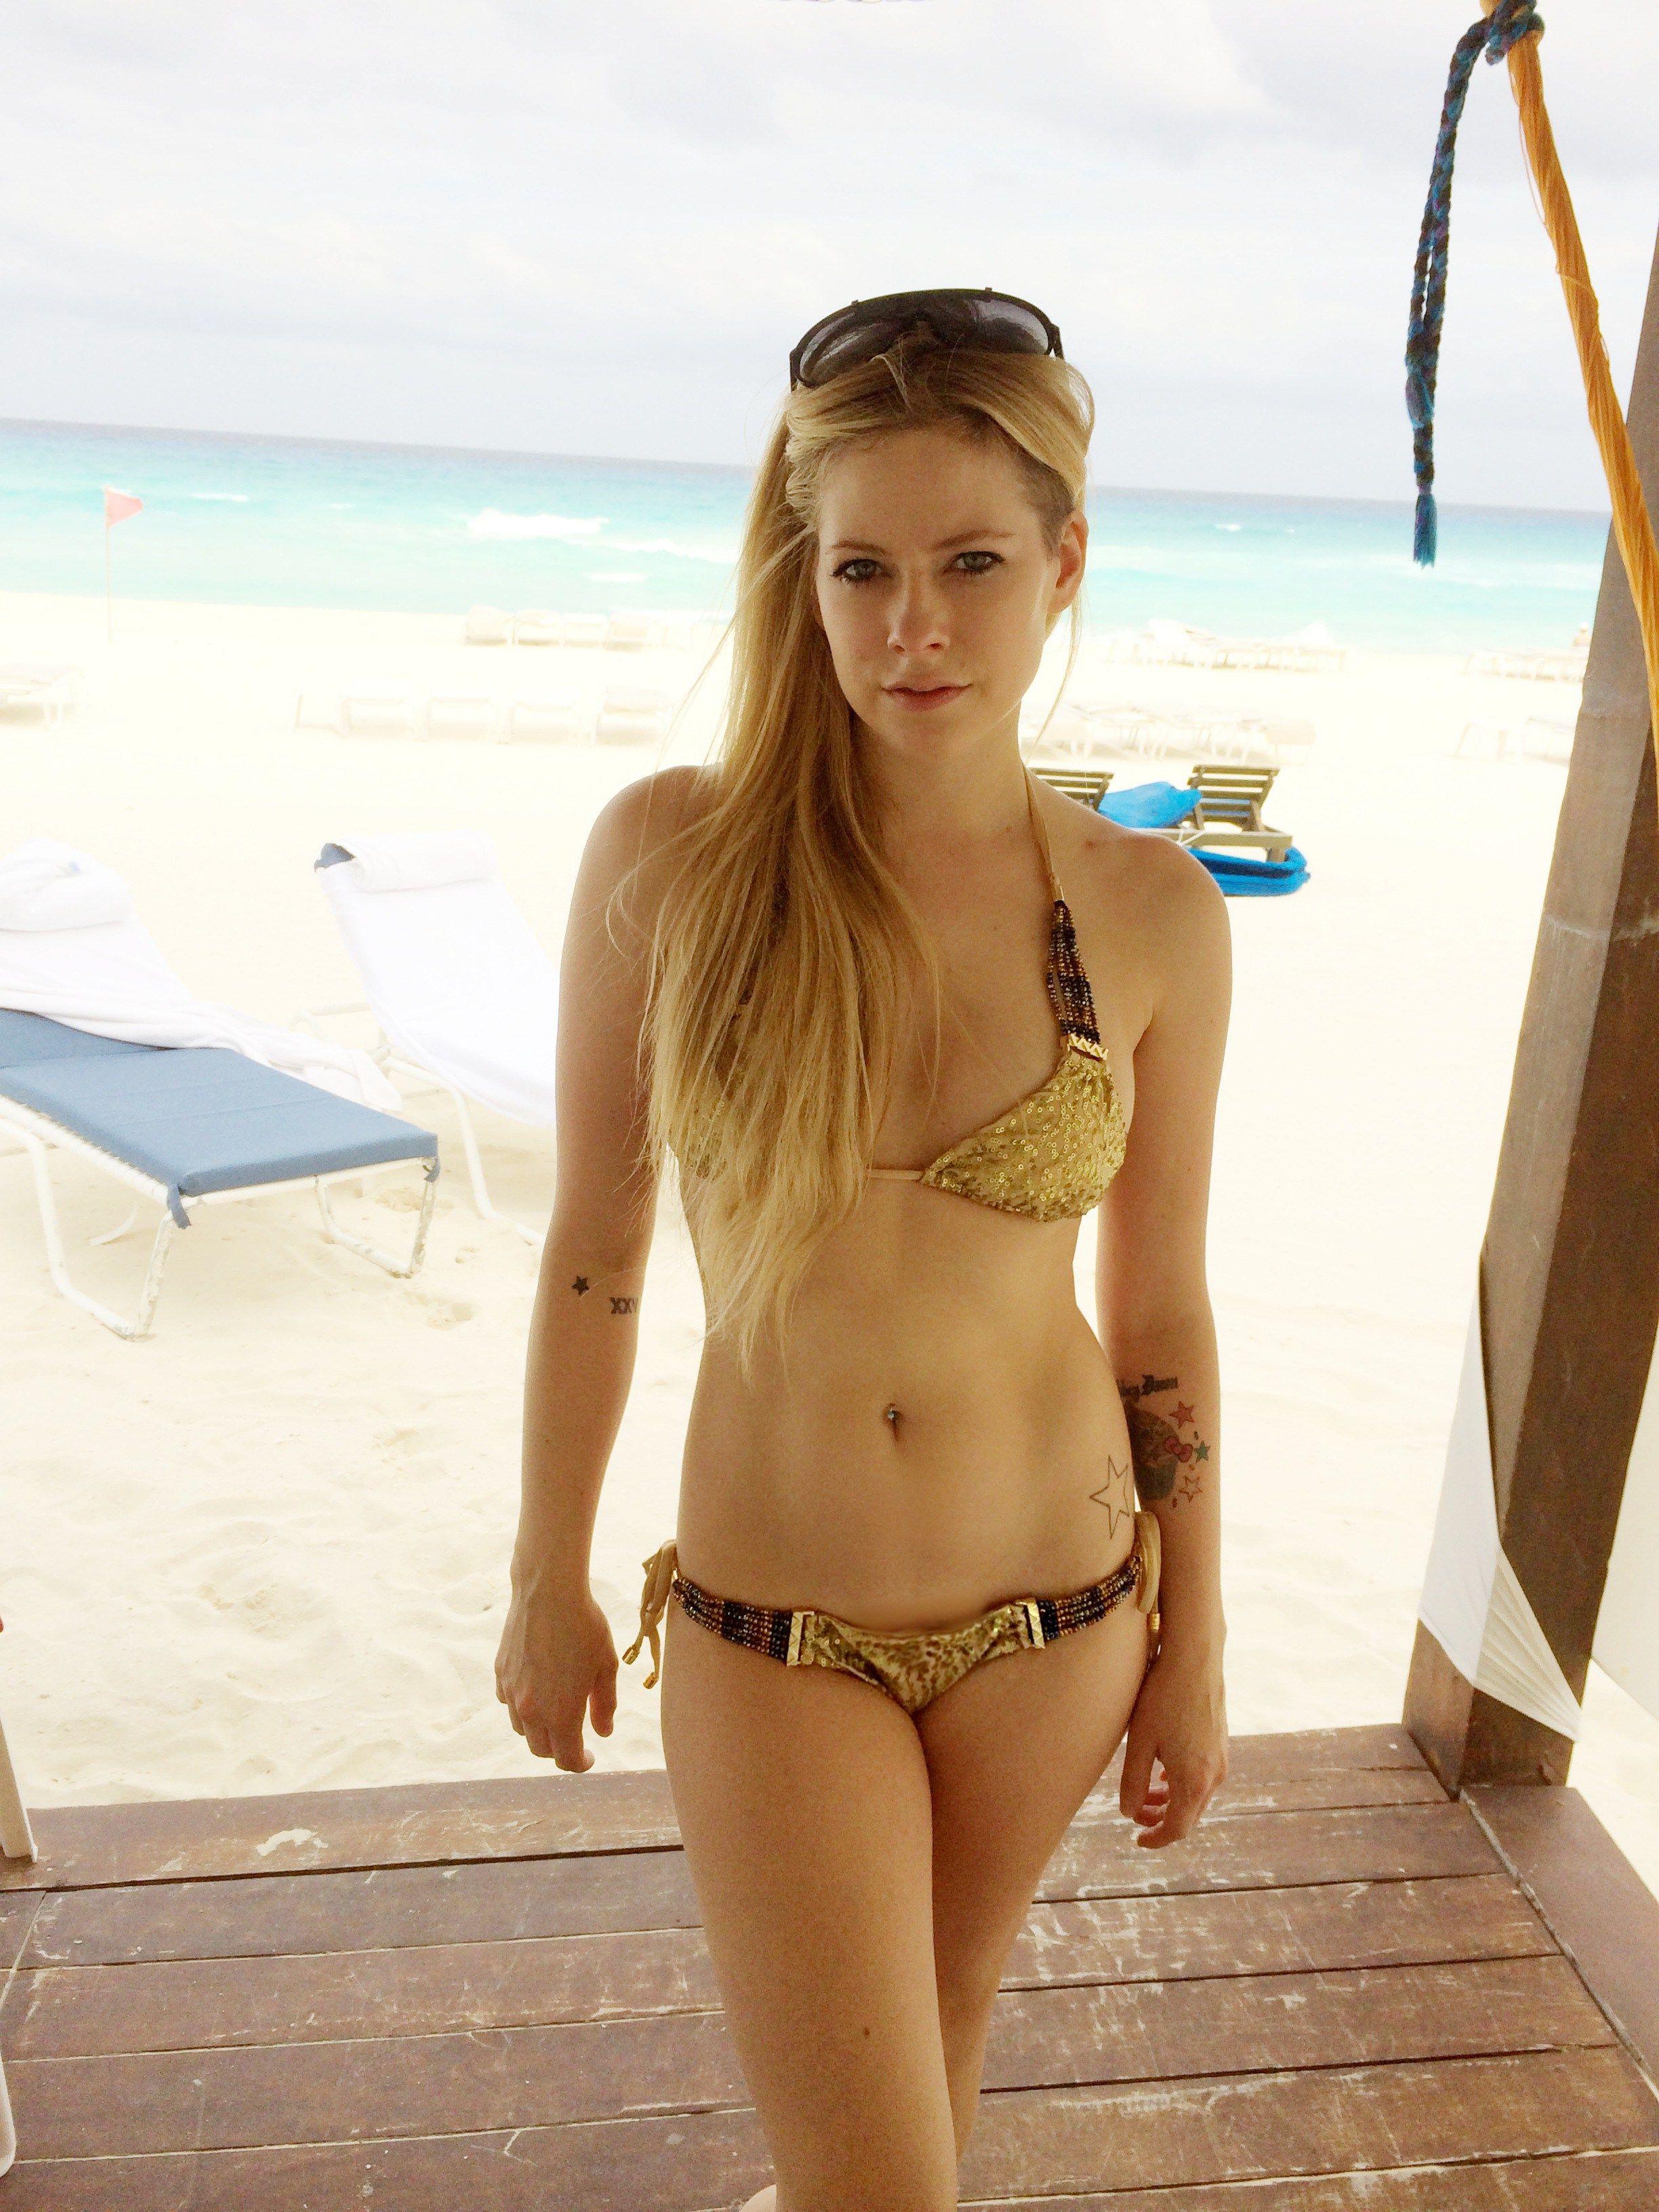 Nude pics of Avril Lavigne. 2018-2019 celebrityes photos leaks!